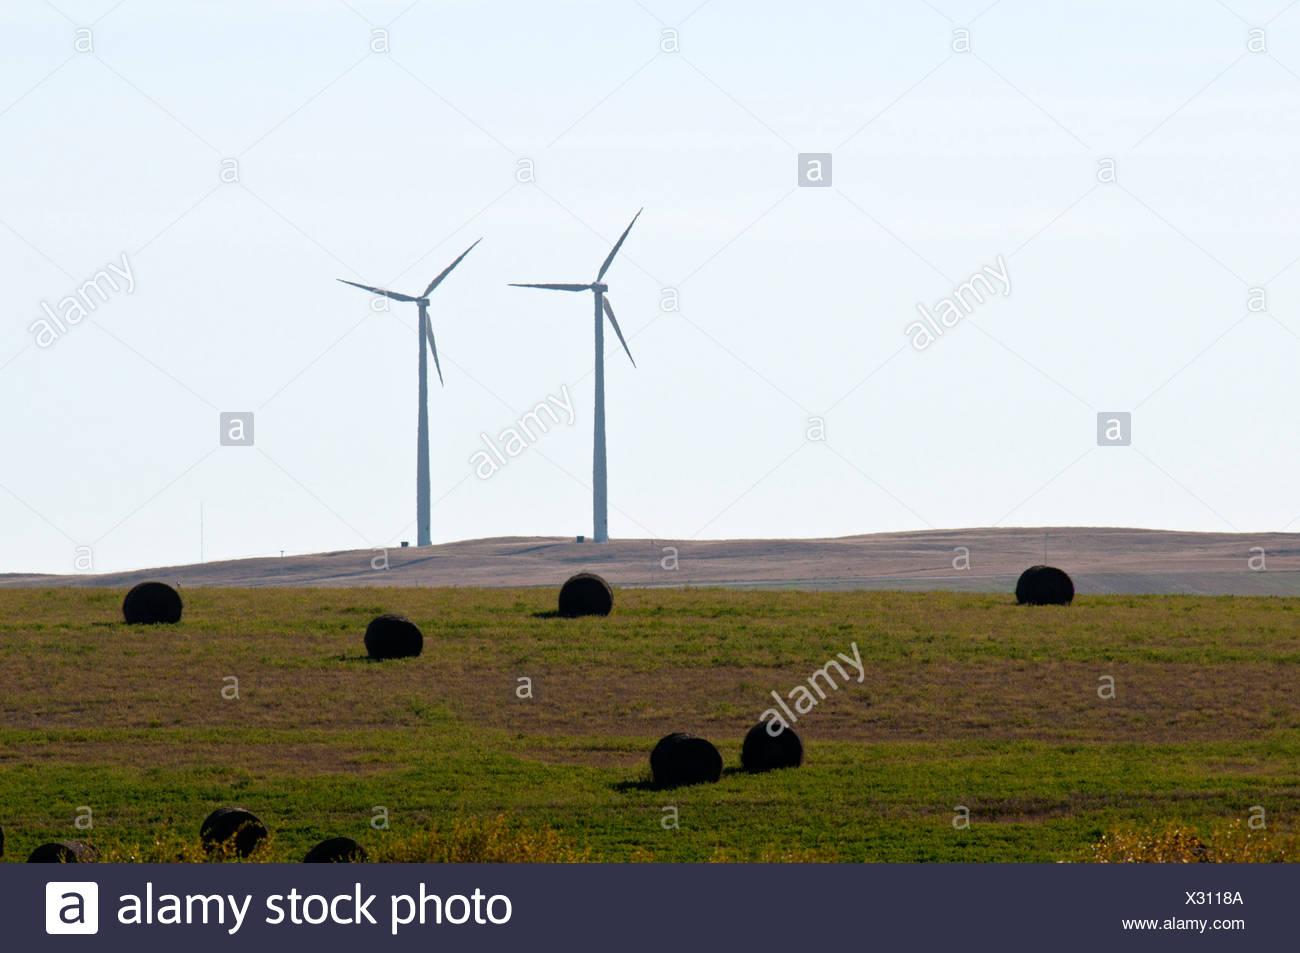 Sonne zu überbrücken, Wind Power Project, Gull Lake, Saskatchewan, Kanada, Wind, Kraft, Energie, Nordamerika, Feld, Generatoren Stockbild